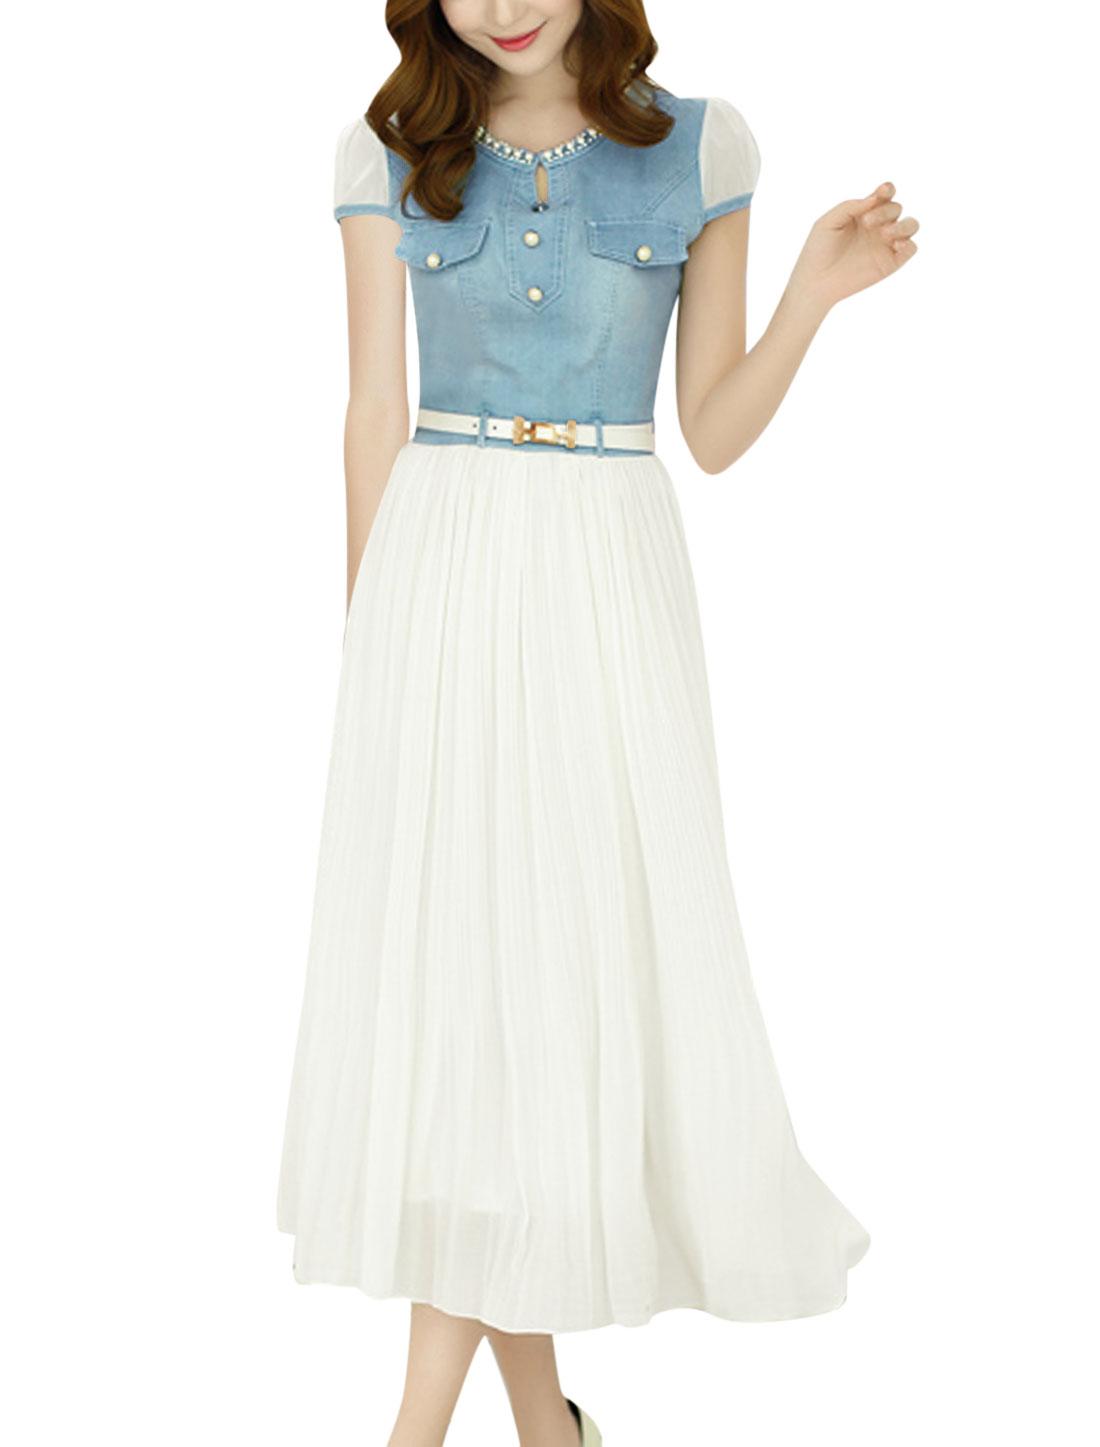 Lady Cap Sleeve Side Zip Denim Chiffon Mid Calf Pleated Dress White Blue M